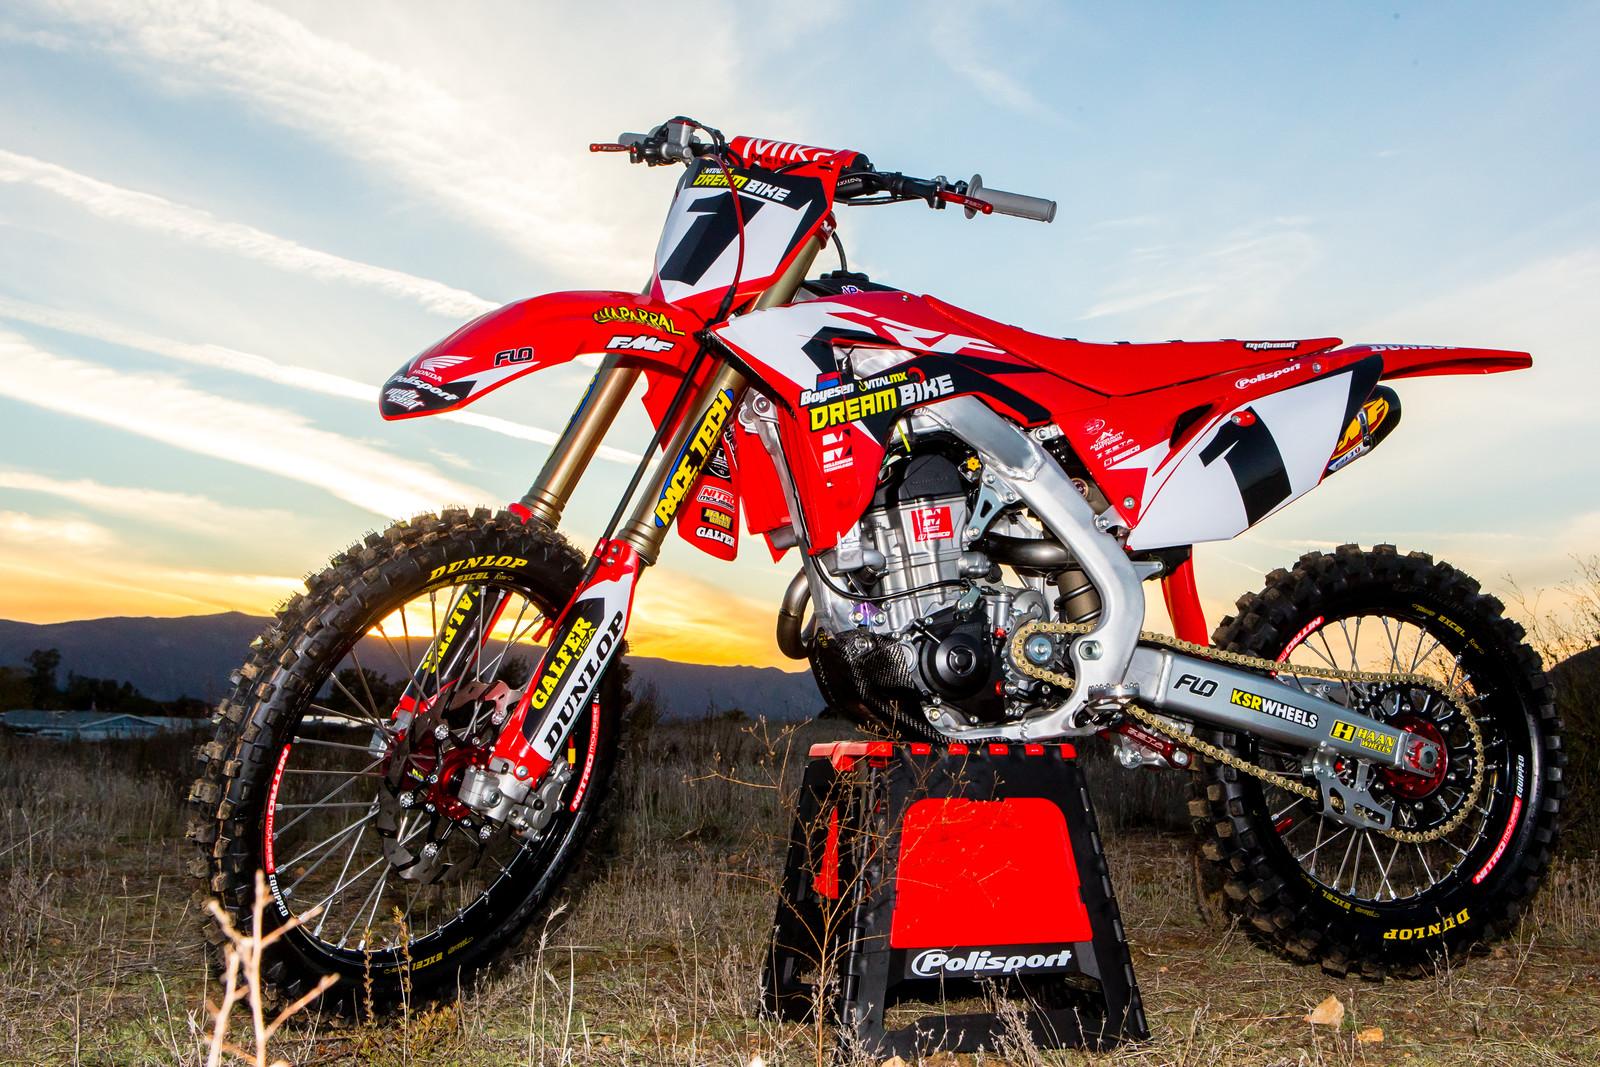 Time To Win The Vital Mx 2018 Honda Crf450r Dream Bike Motocross